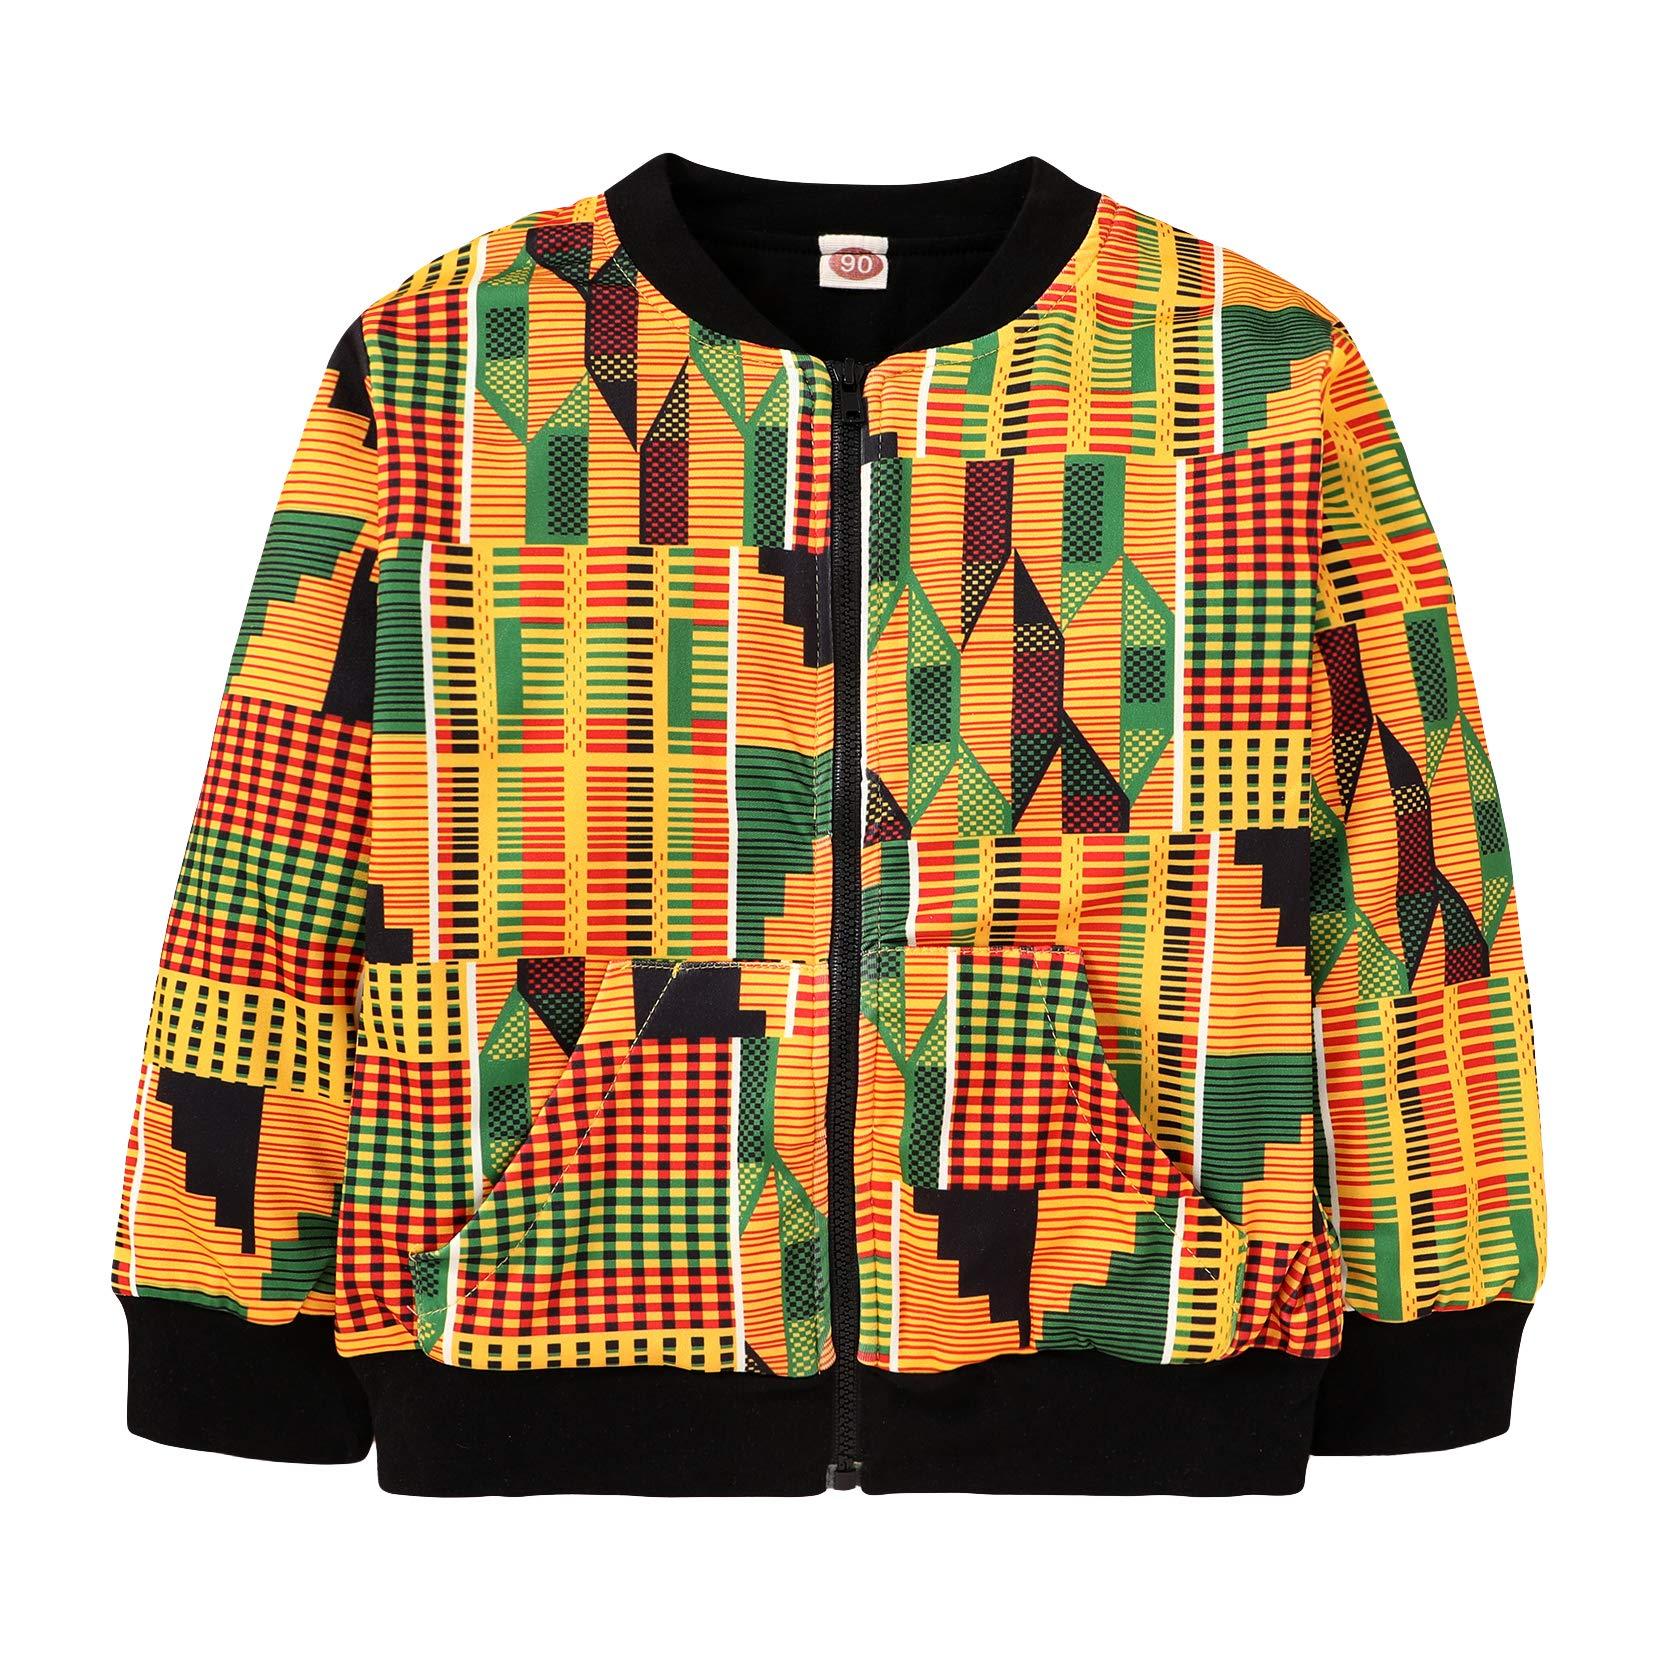 Toddler Little Girls Boys Boho National Print Windproof Outerwear Dashiki Coat WOCACHI Unisex Kids African Jackets